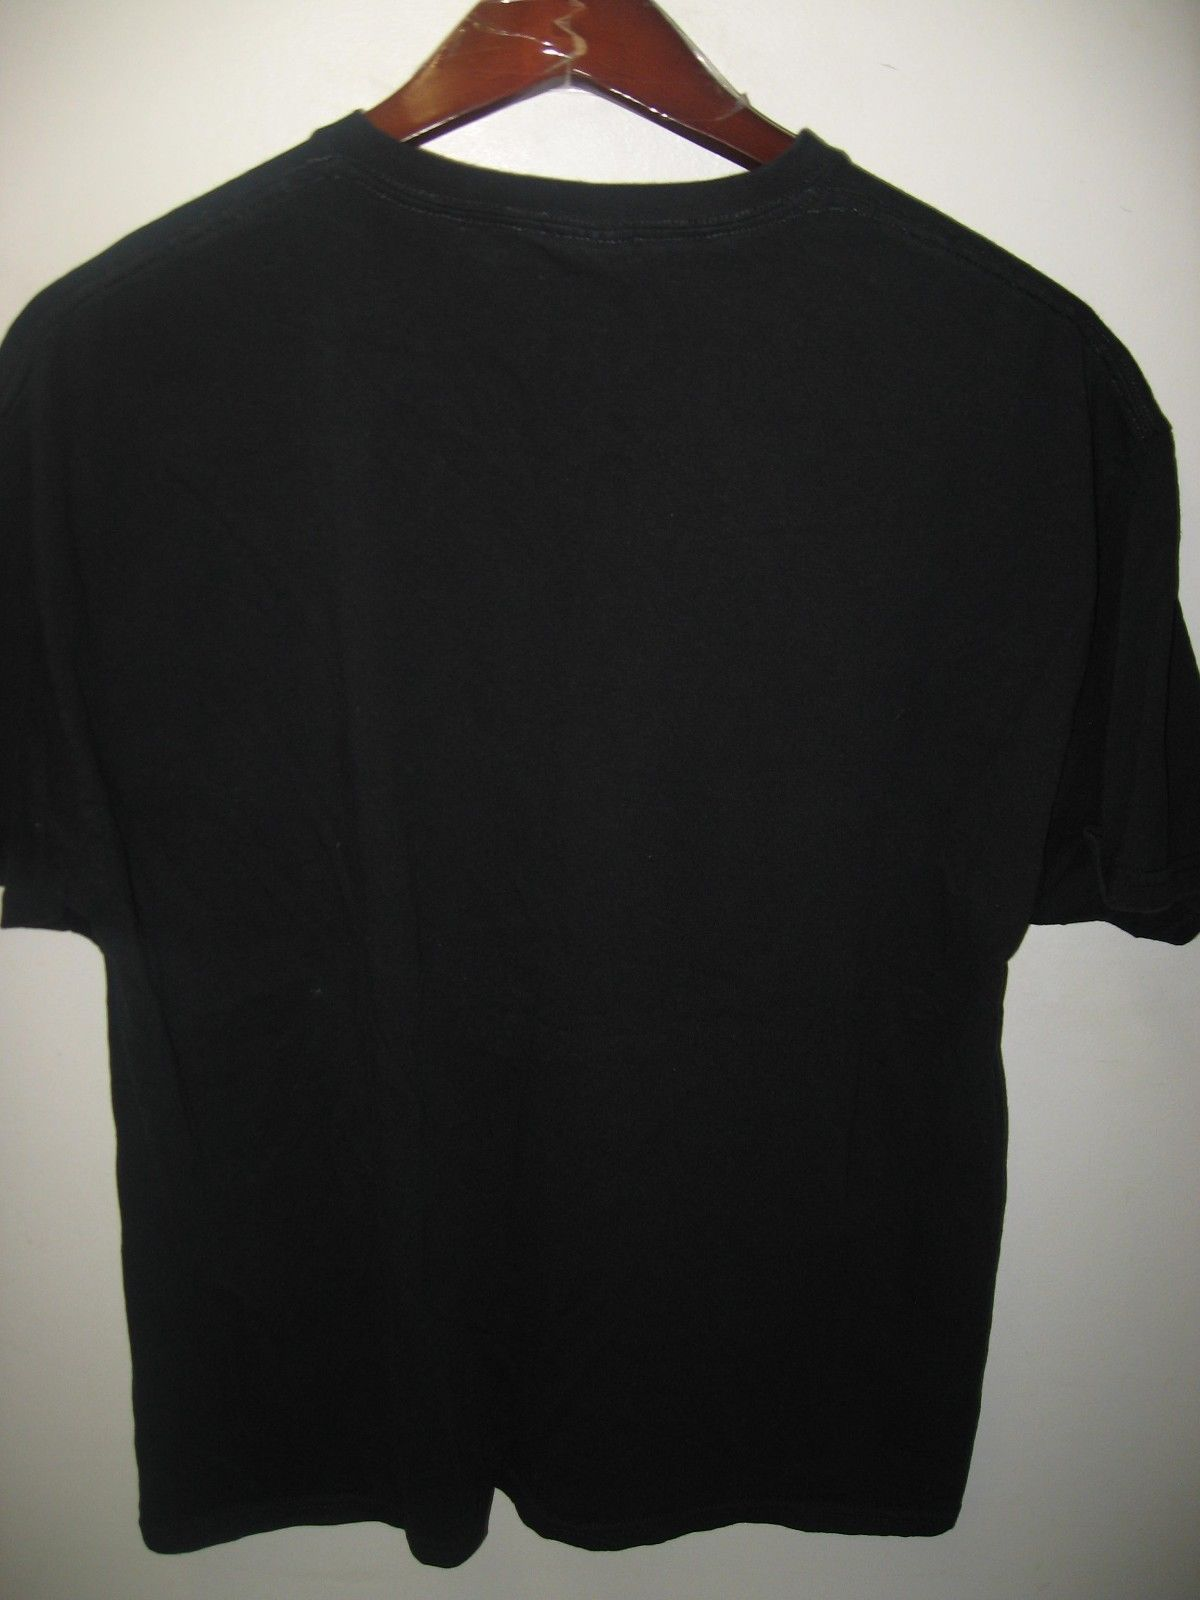 San Francisco Giants Baseball World Series Champion Players 2012 Team T Shirt XL